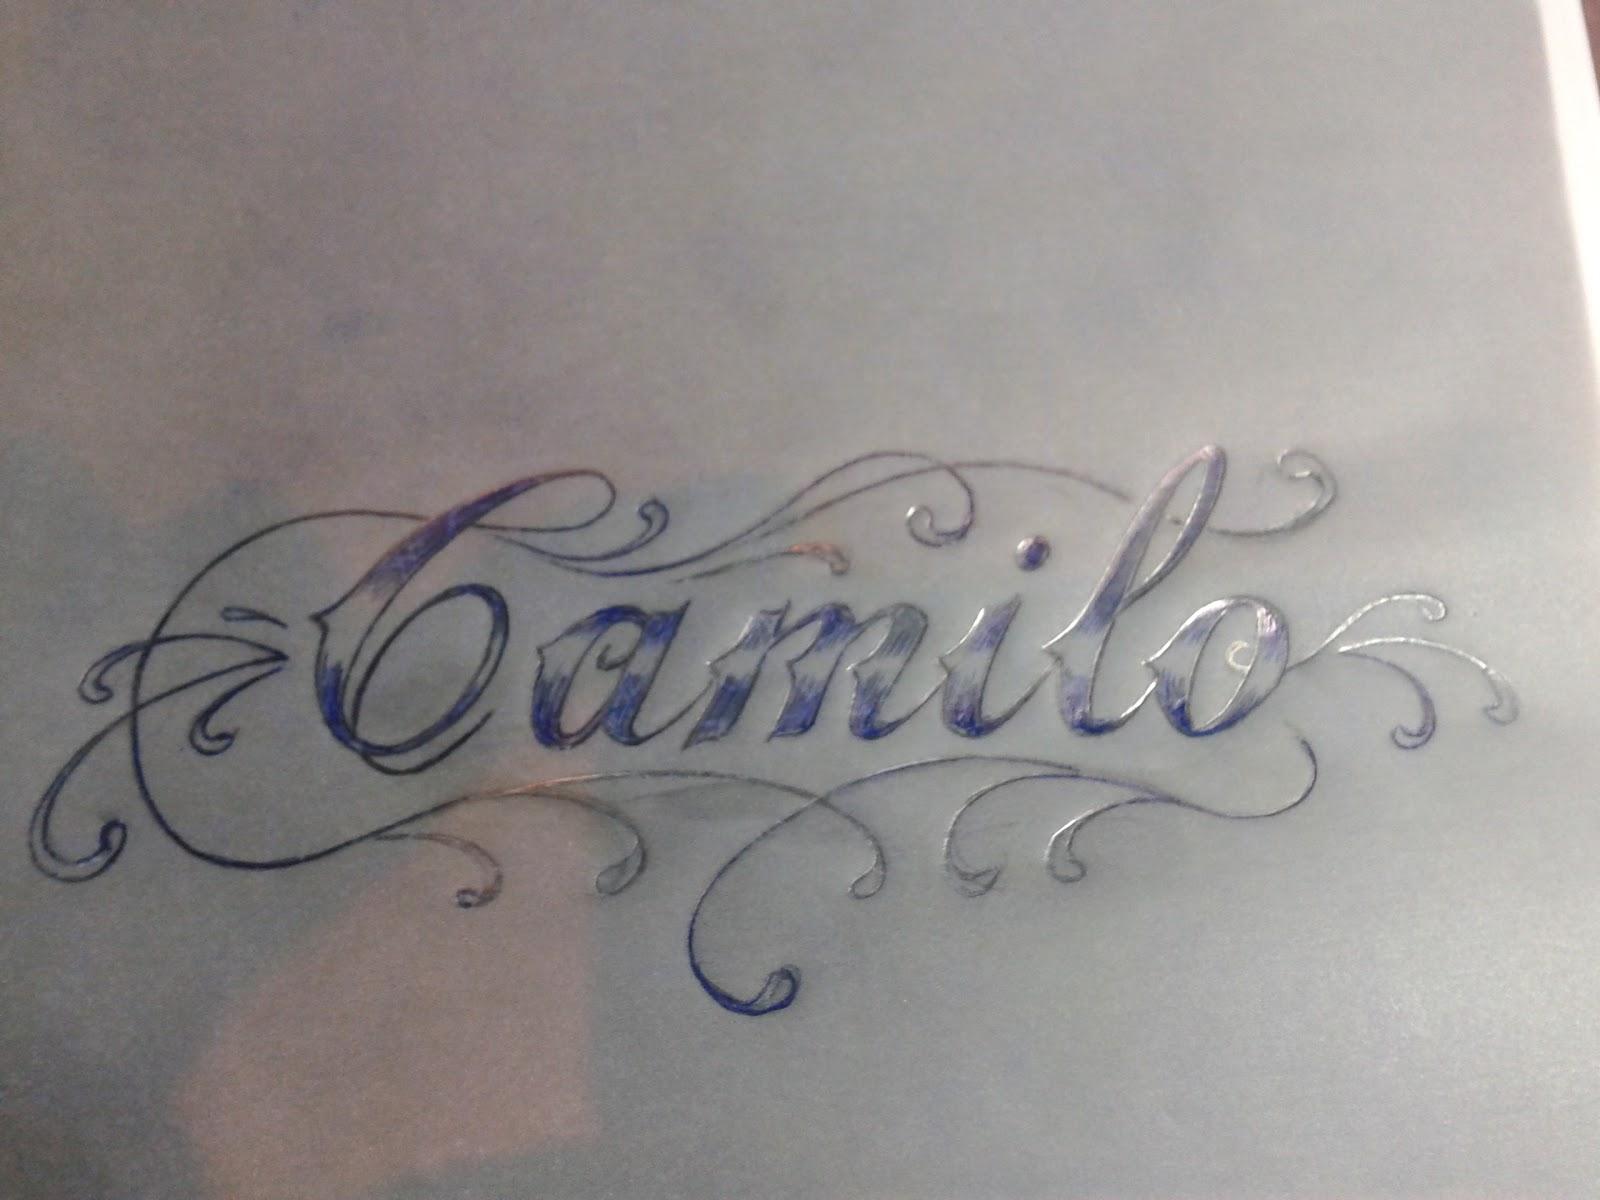 Exive S Tattoo Letras Cholas